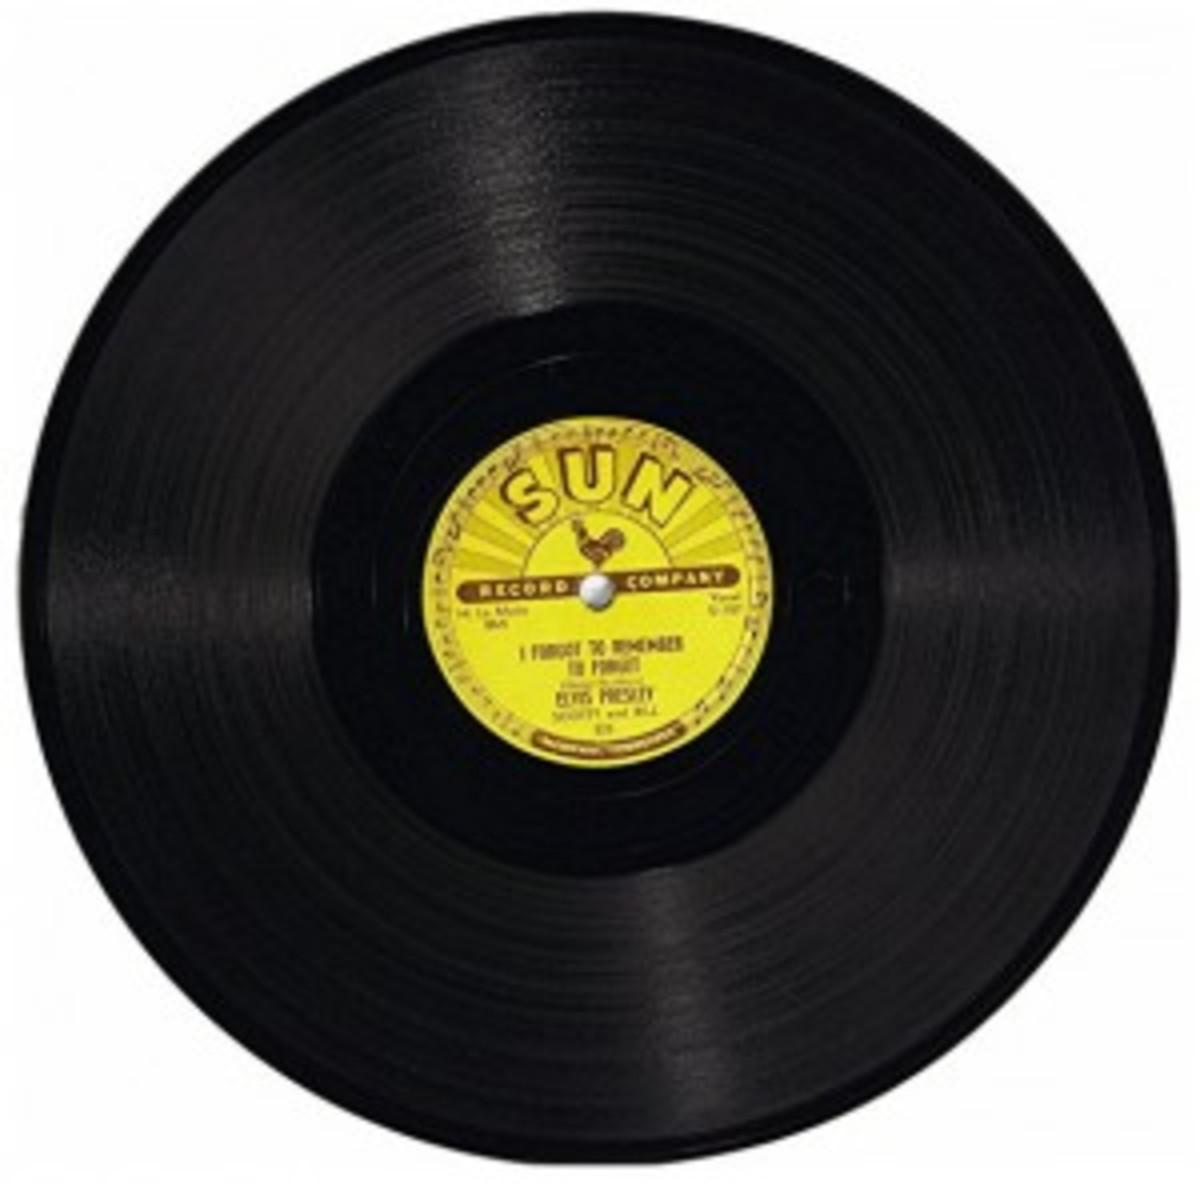 Elvis 78 on Sun Records